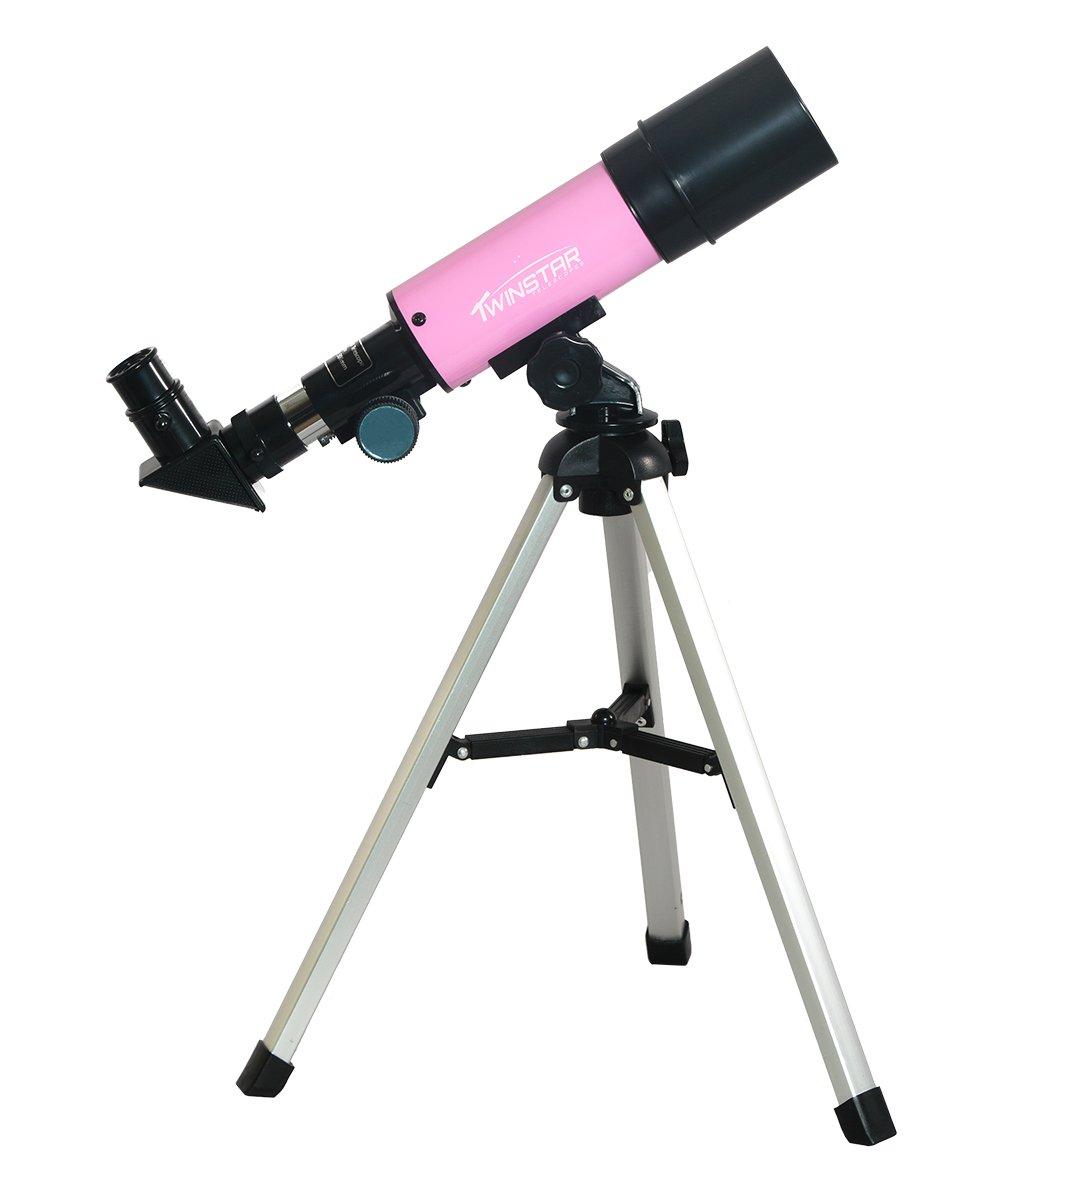 TwinStar 50mm Beginner Compact Refractor Telescope Kids Pak Bundle with Tabletop Tripod (Pink)